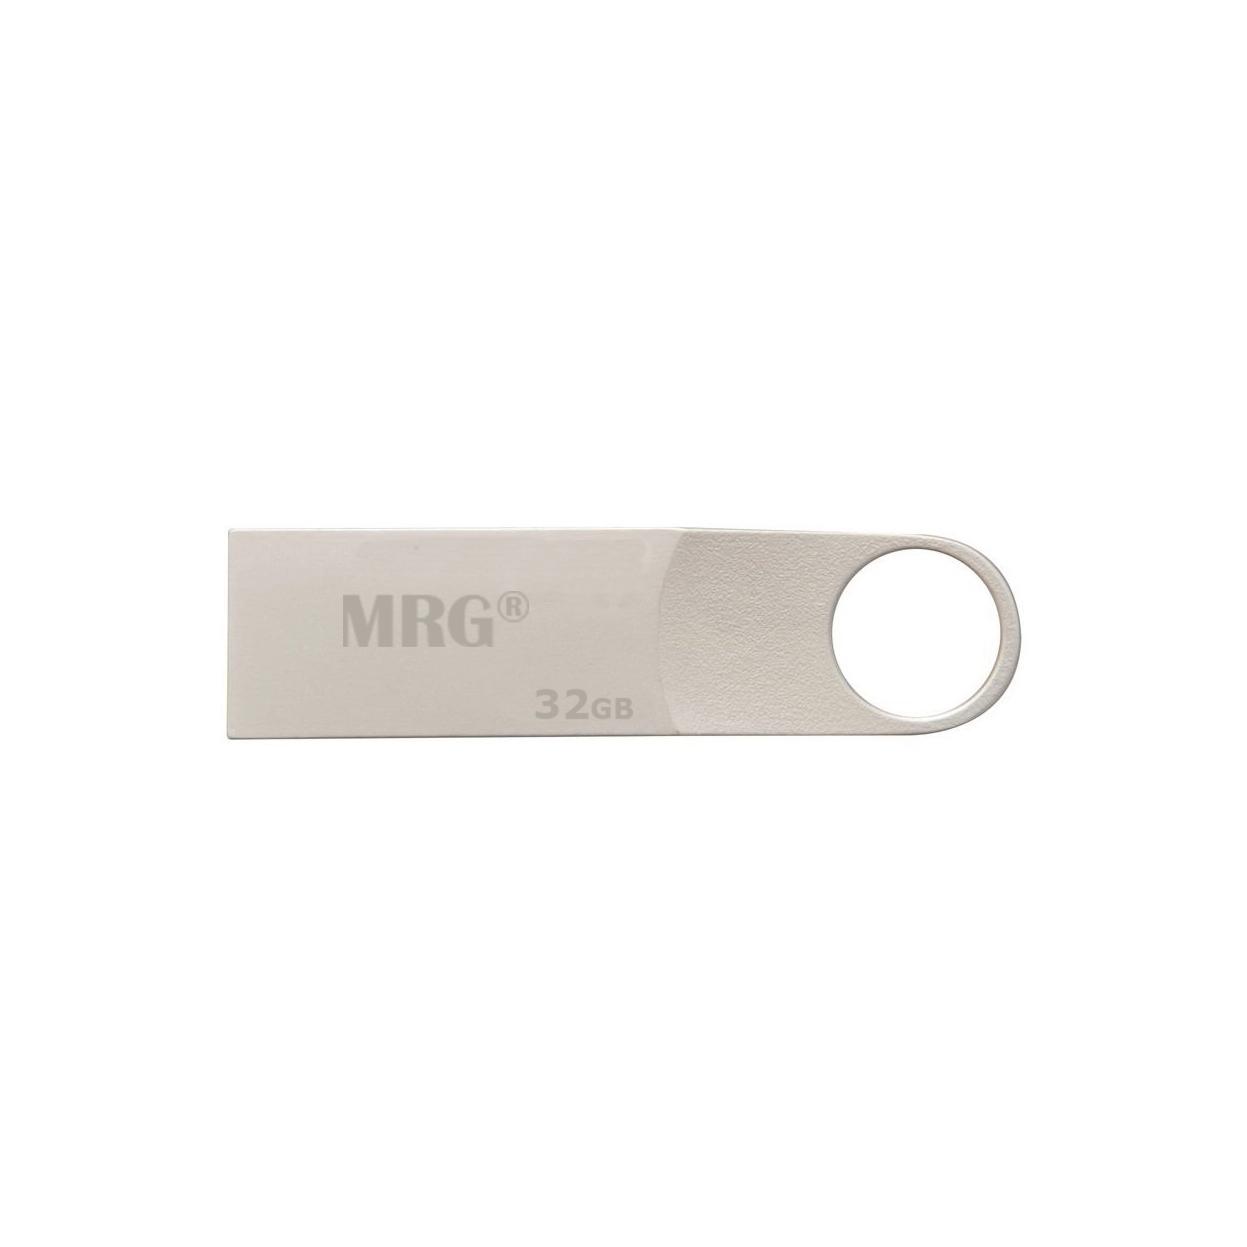 Memorie USB MRG M-SE9, USB 2.0, 32 GB, Gri